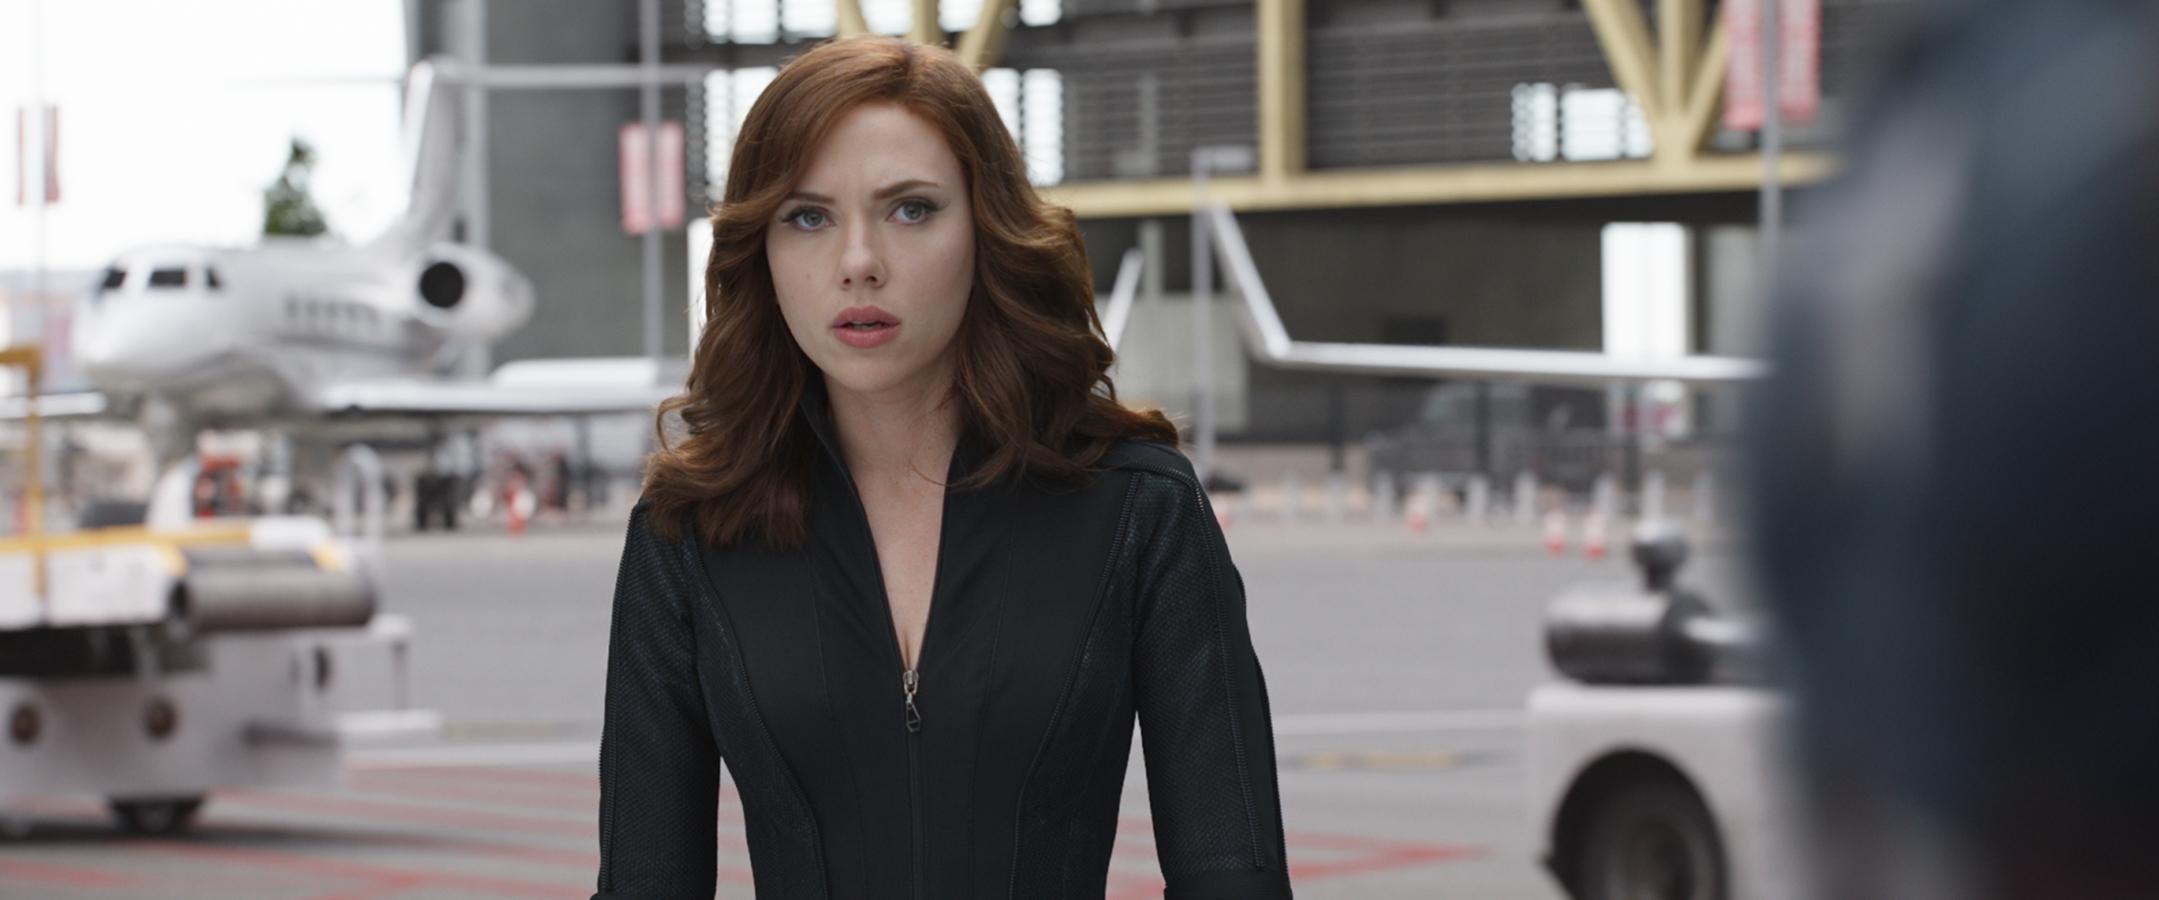 Scarlett Johansson: Black Widow, Scarlett Johansson, Дівчата, Natasha Romanoff